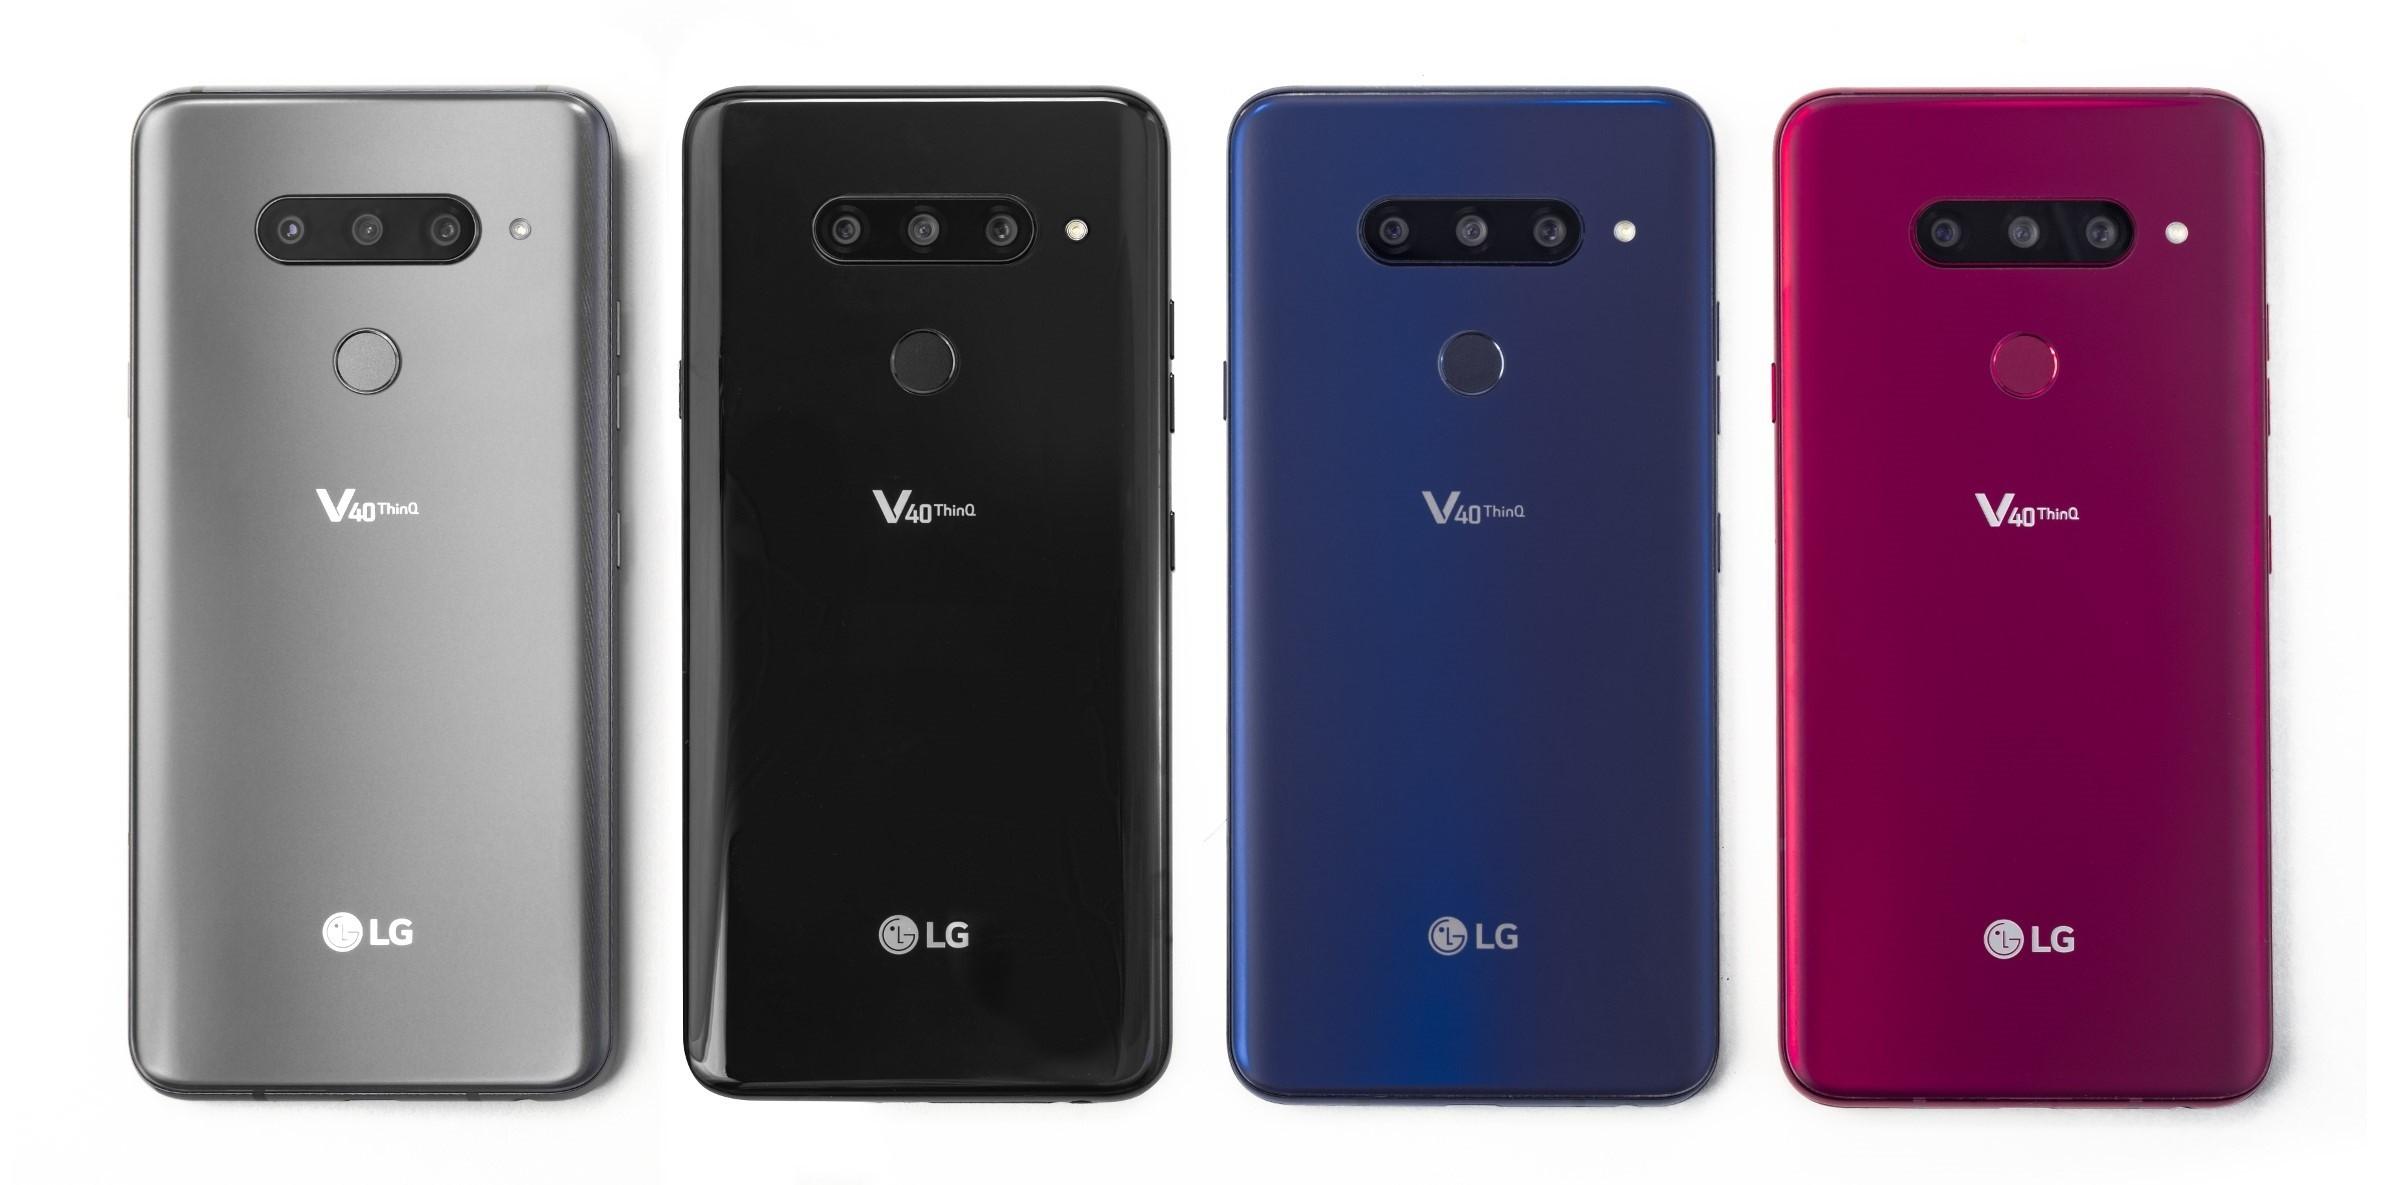 LG V40 ThinQ售价揭晓:900美元起,10月18日开售